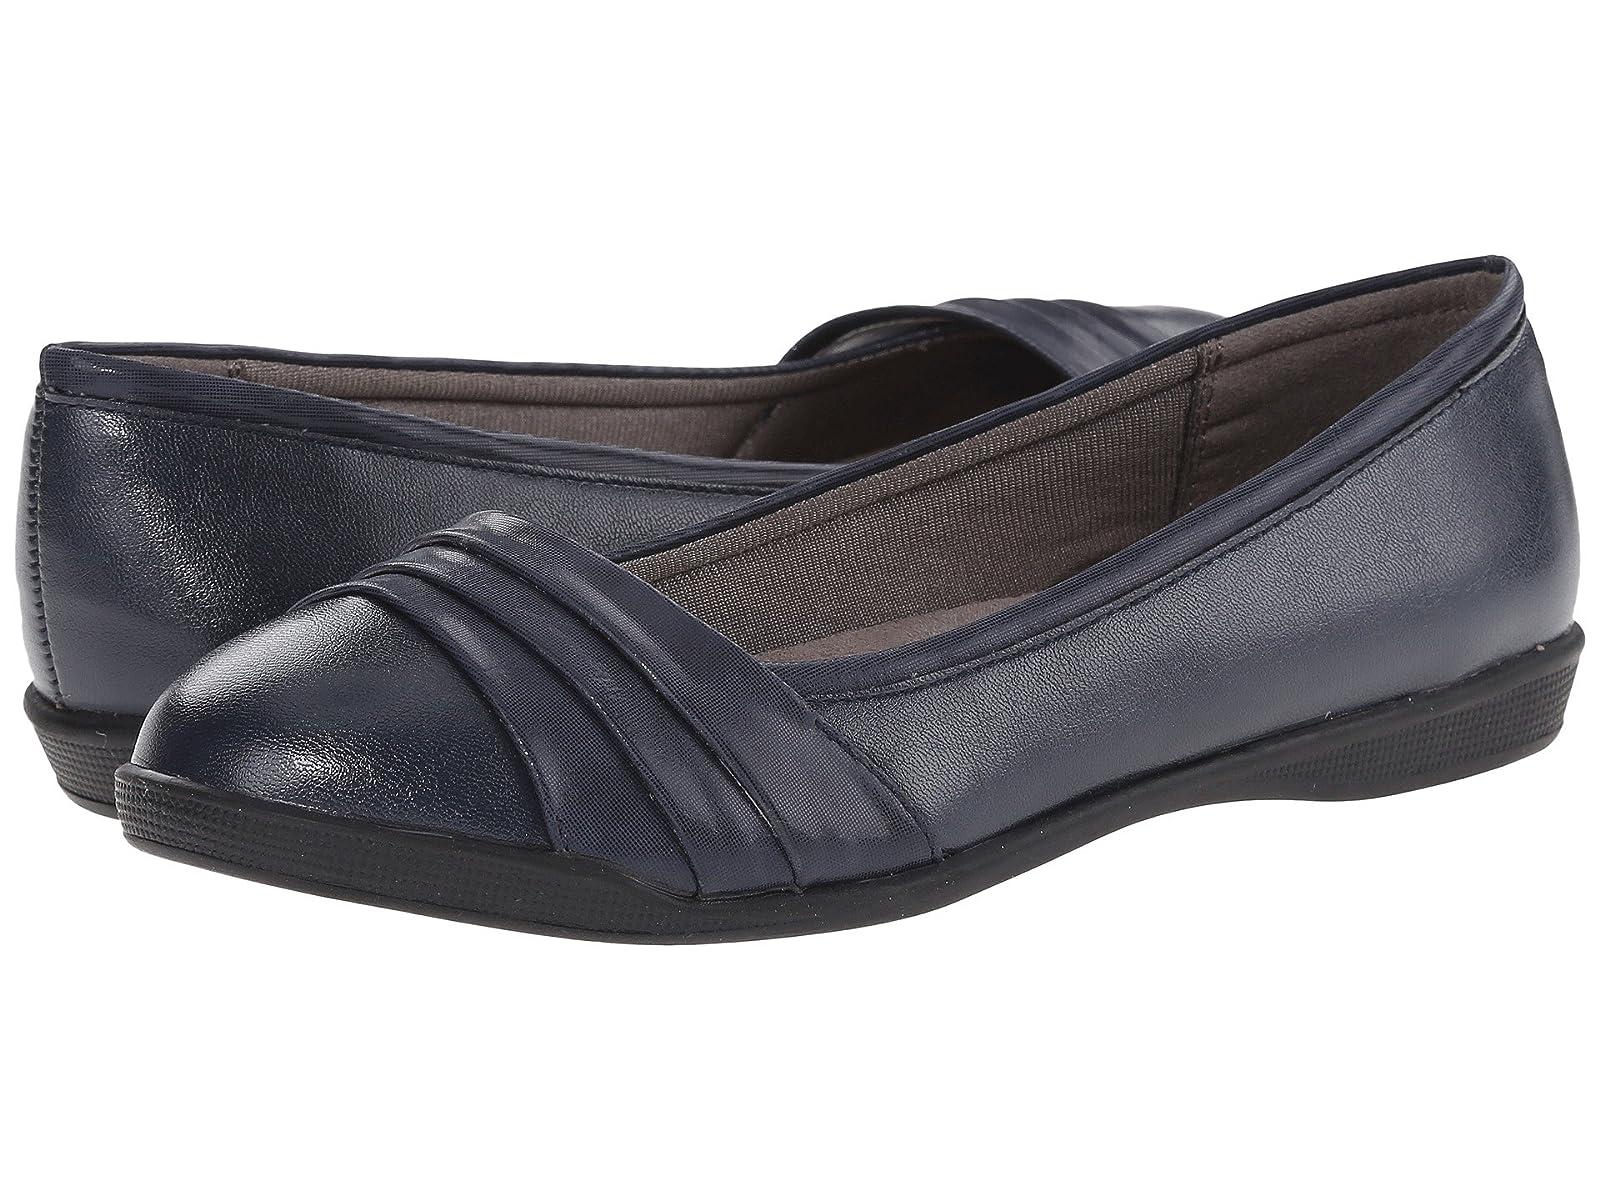 LifeStride GawkCheap and distinctive eye-catching shoes